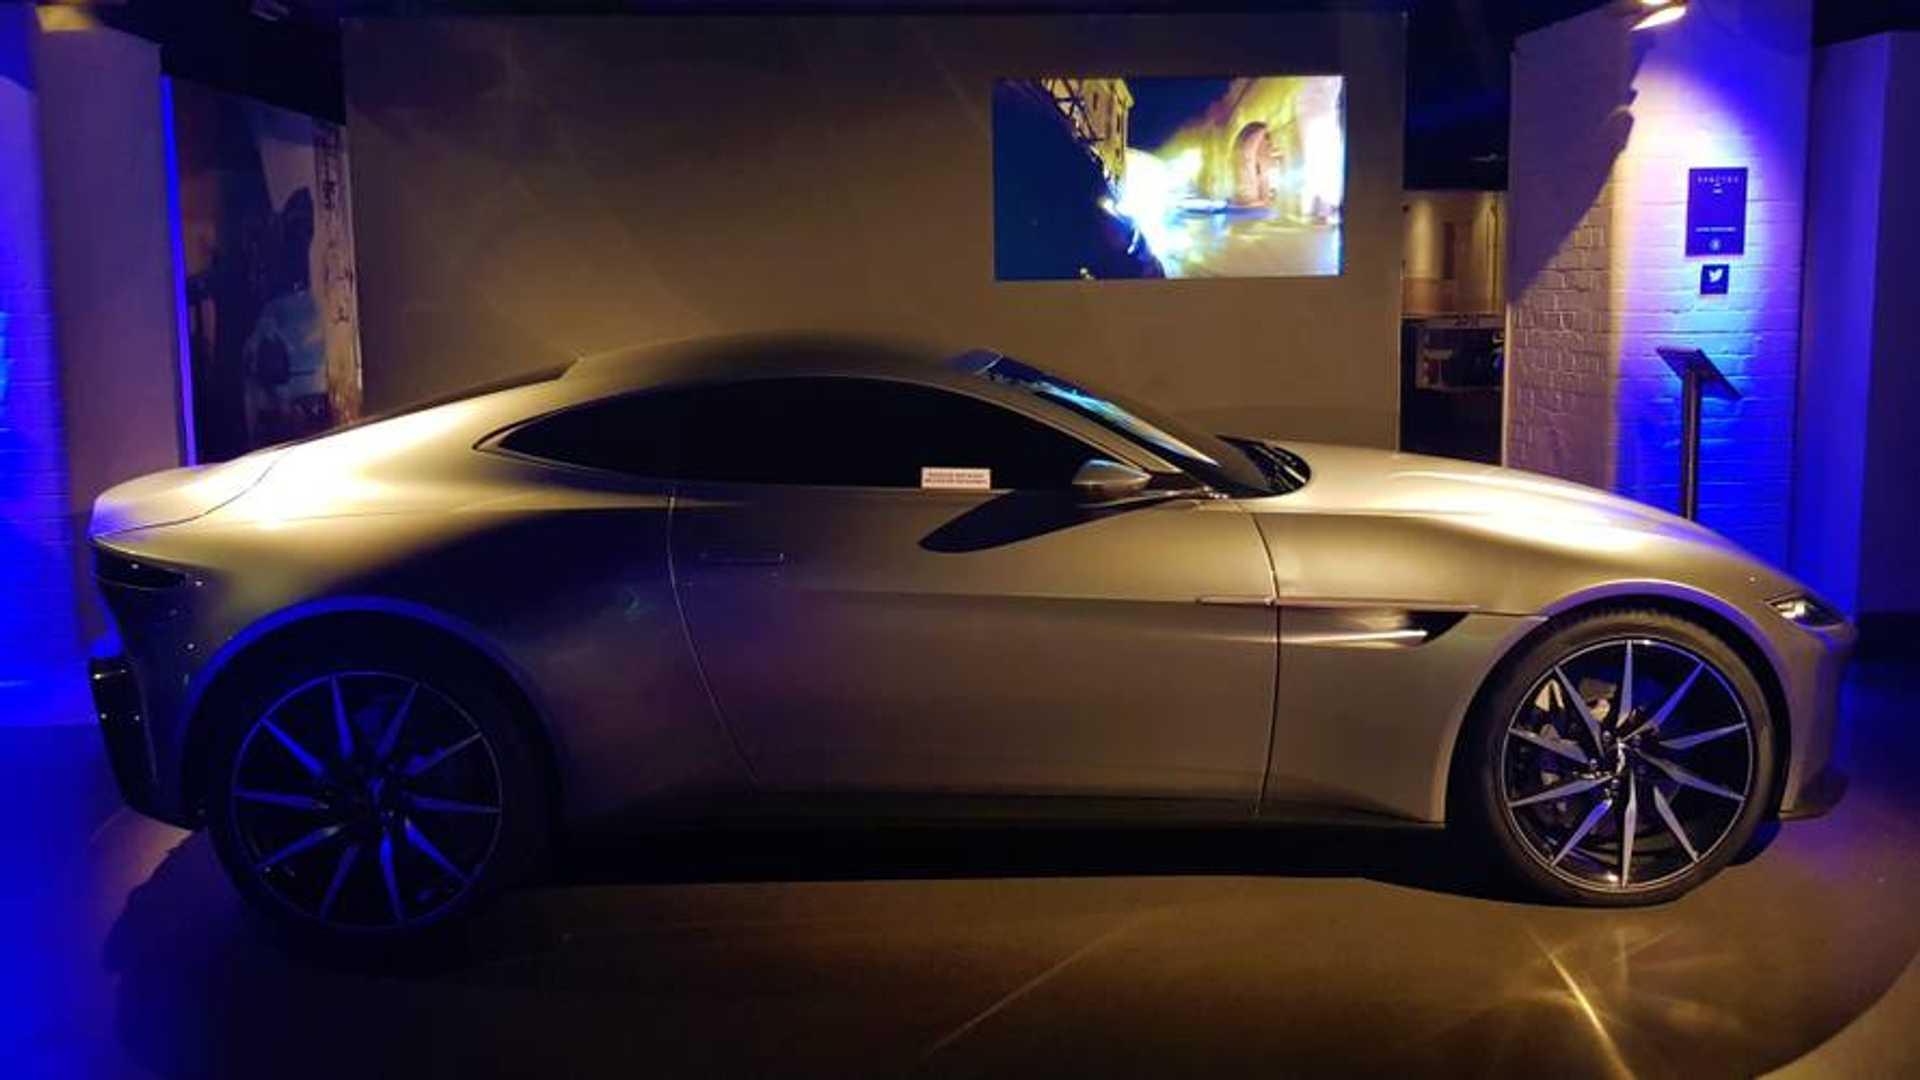 Aston Martin To Celebrate Global James Bond Day In London